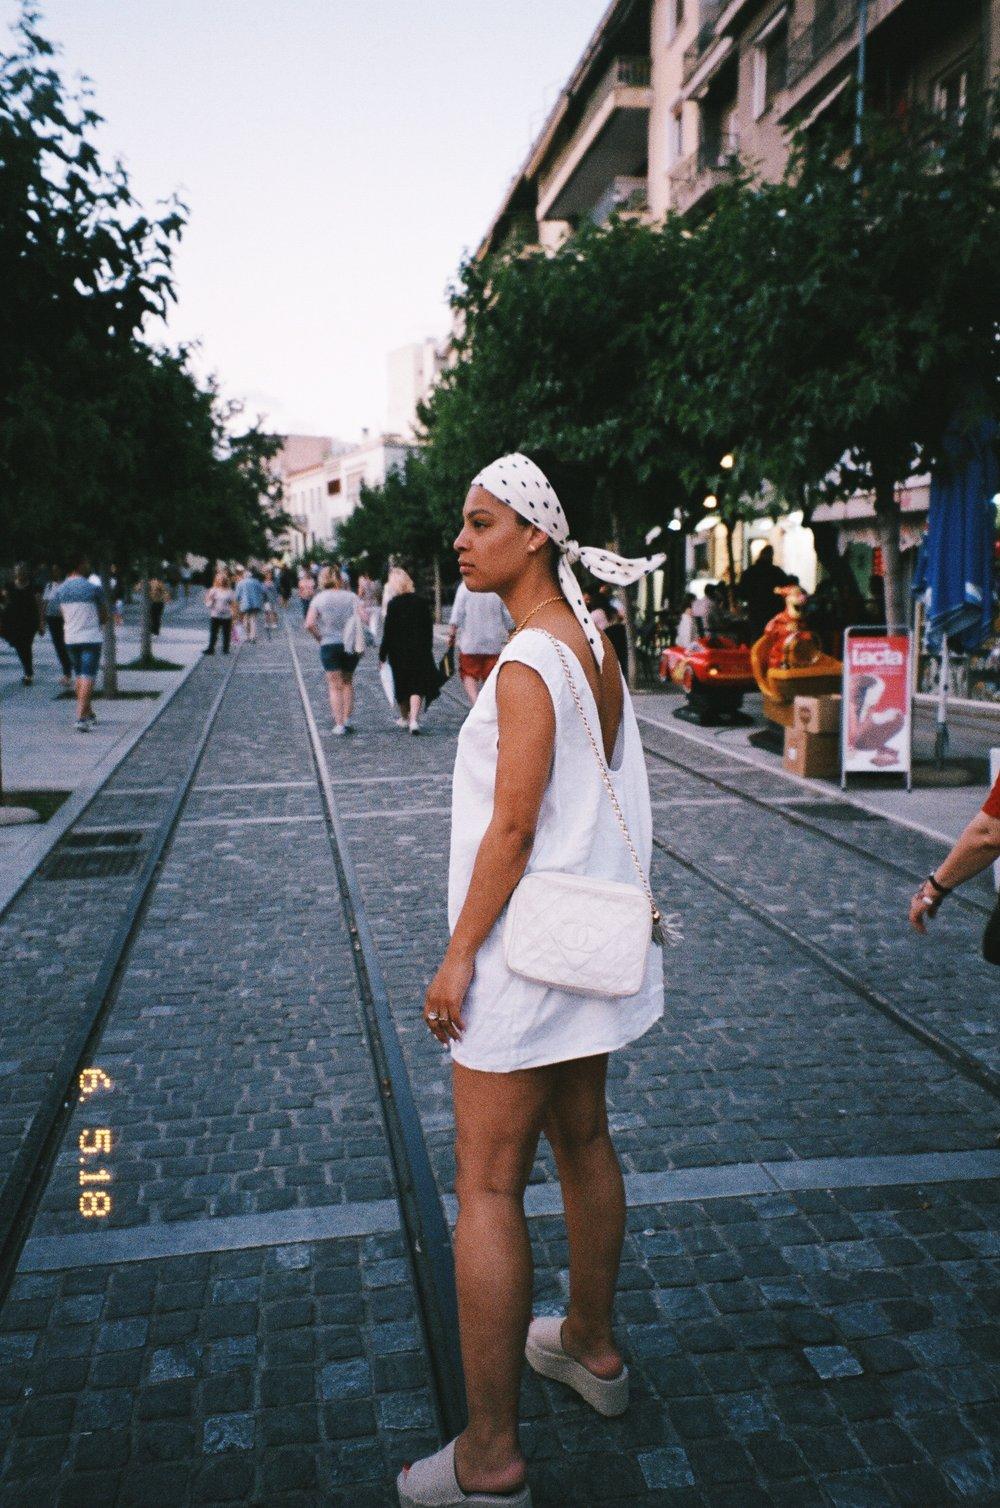 Wearing Reformation Dress, Zara Platforms & Headscarf, Vintage Chanel Camera Bag.